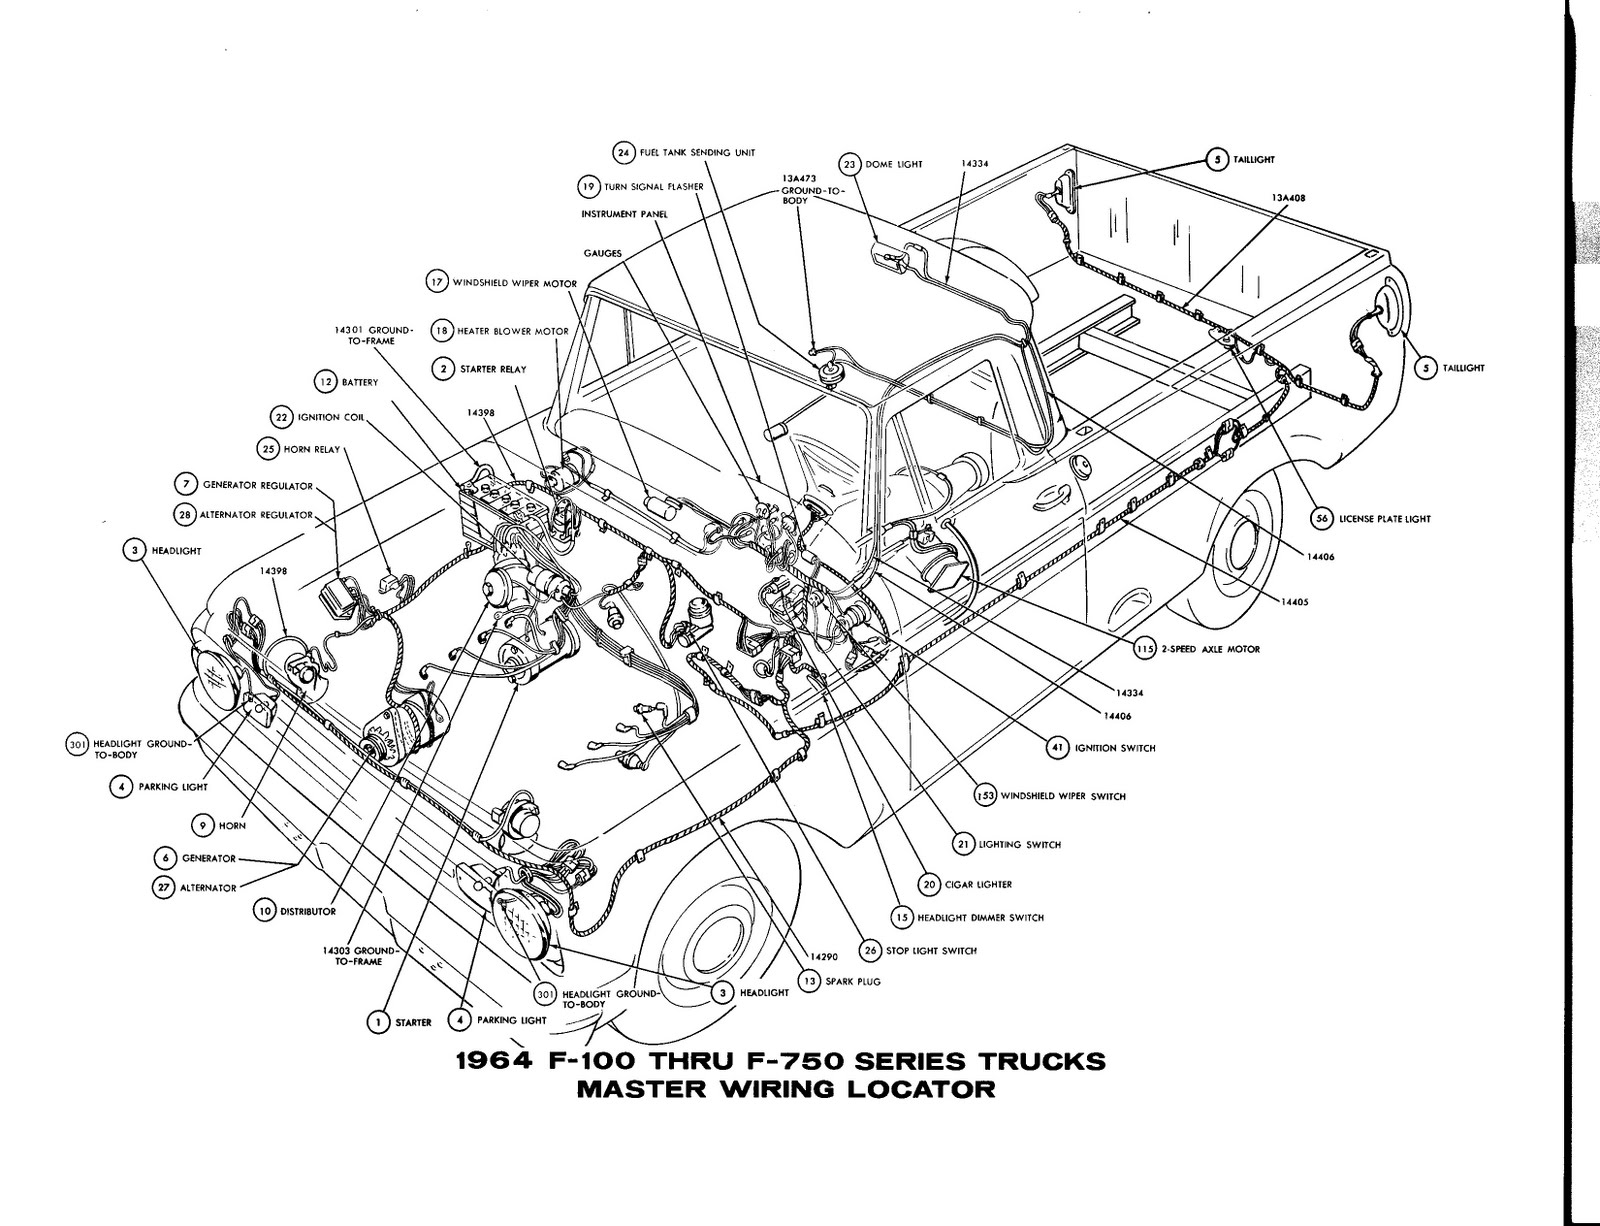 Free Auto Wiring Diagram: 1964 Ford F-100 Thru F-750 Truck